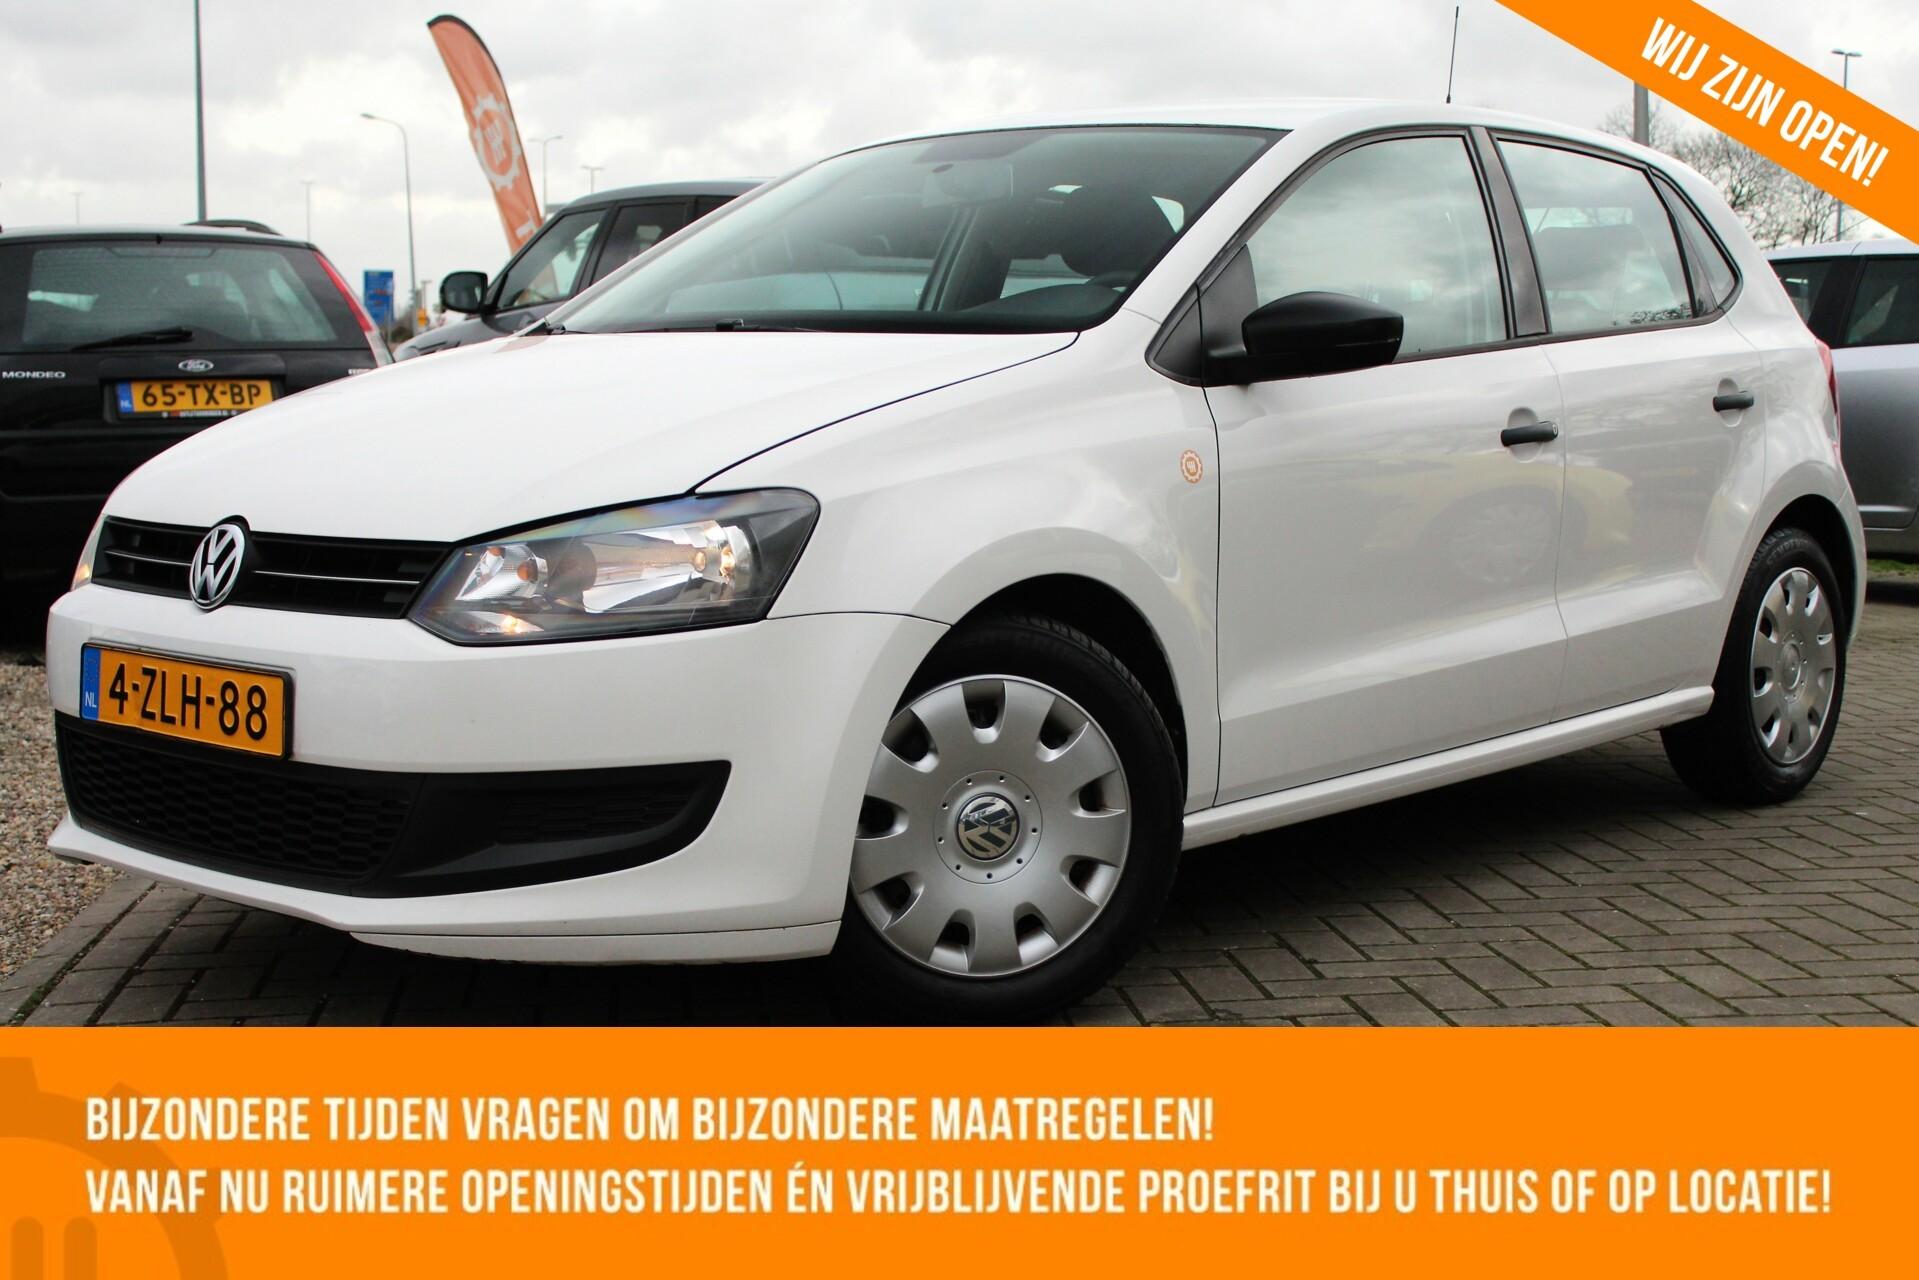 Caroutlet Groningen - Volkswagen Polo 1.2 Easyline   AIRCO   5 DEURS   ELEK PAKKET